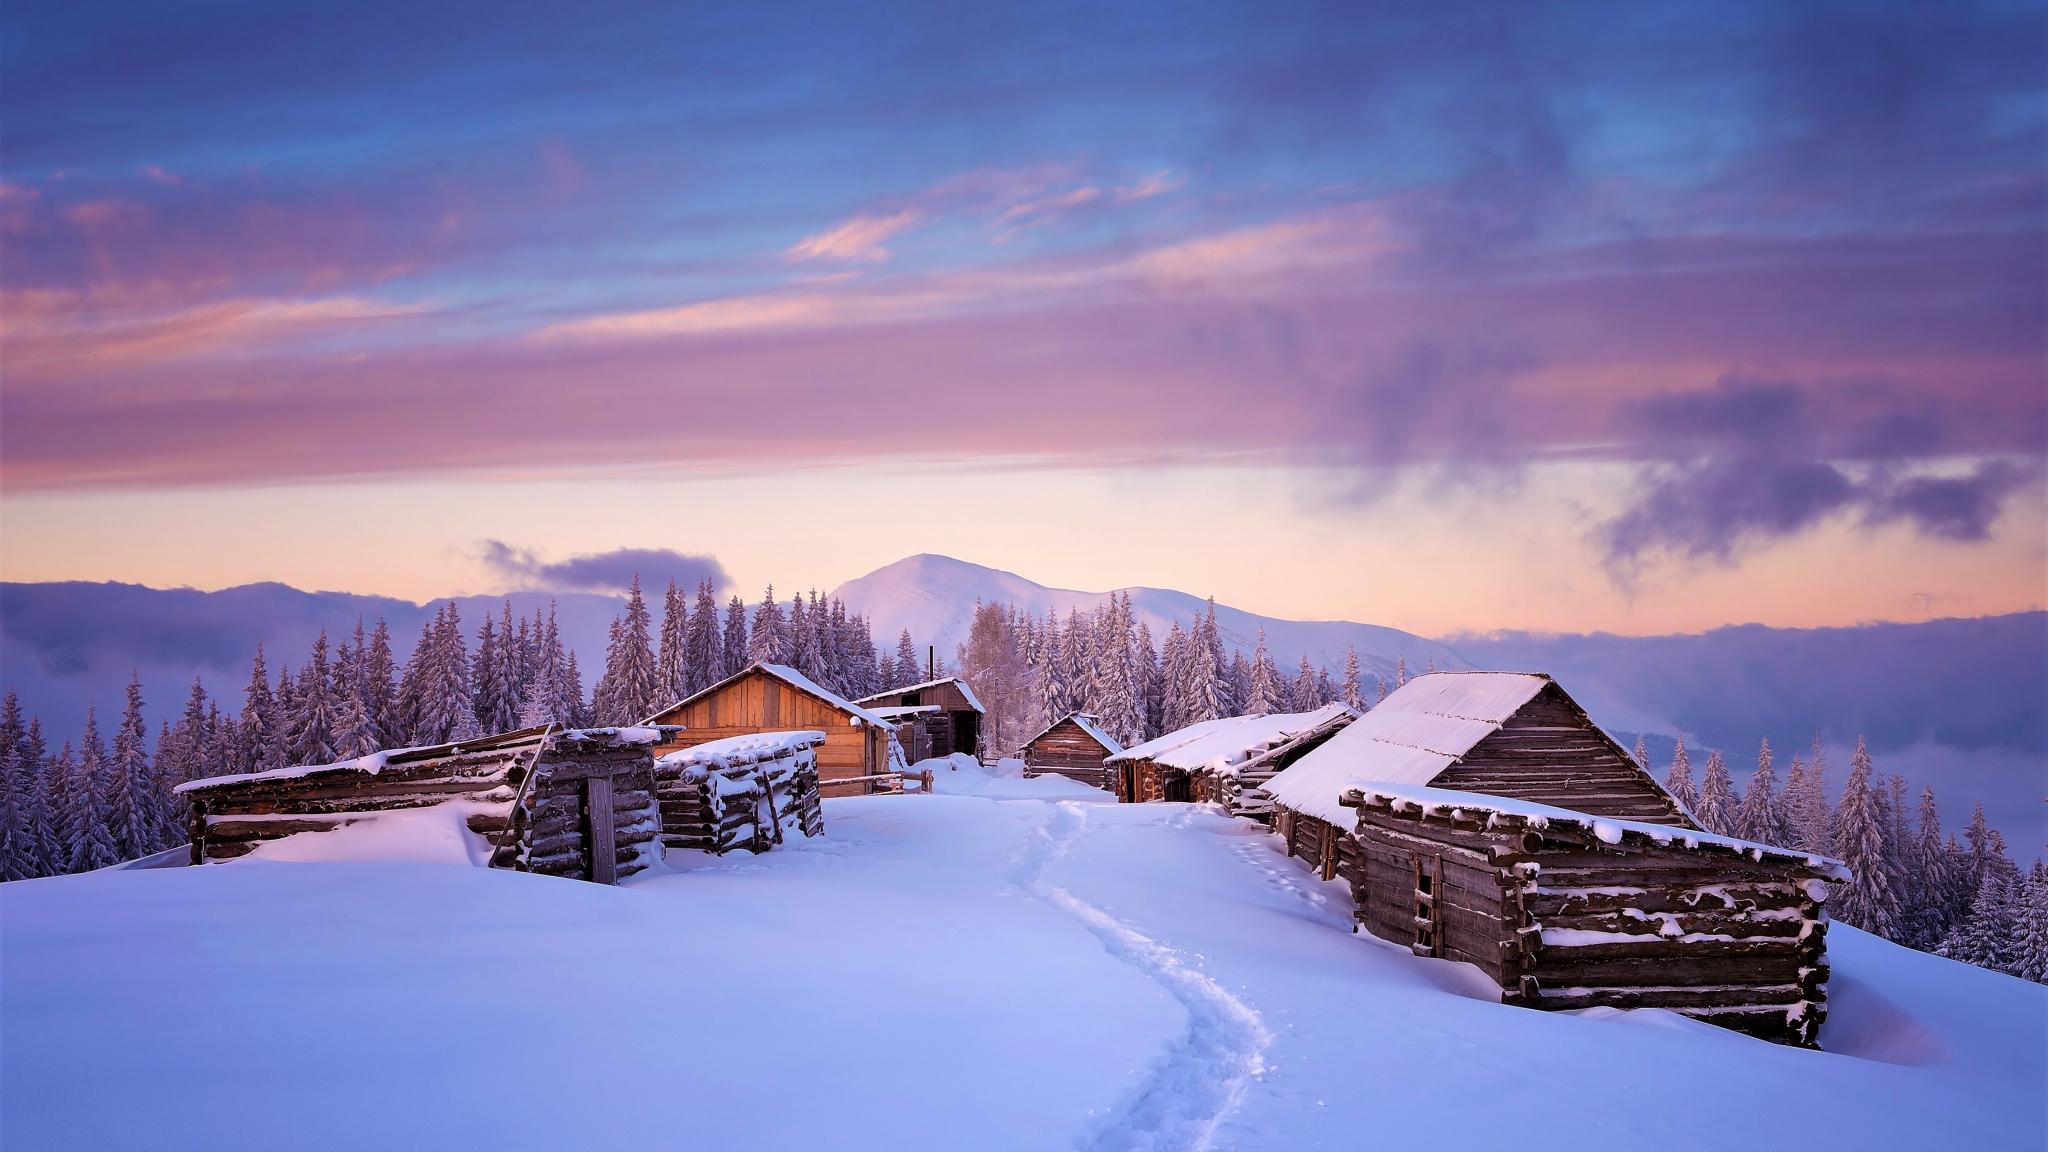 Download 2048x1152 wallpaper houses, winter, landscape ...